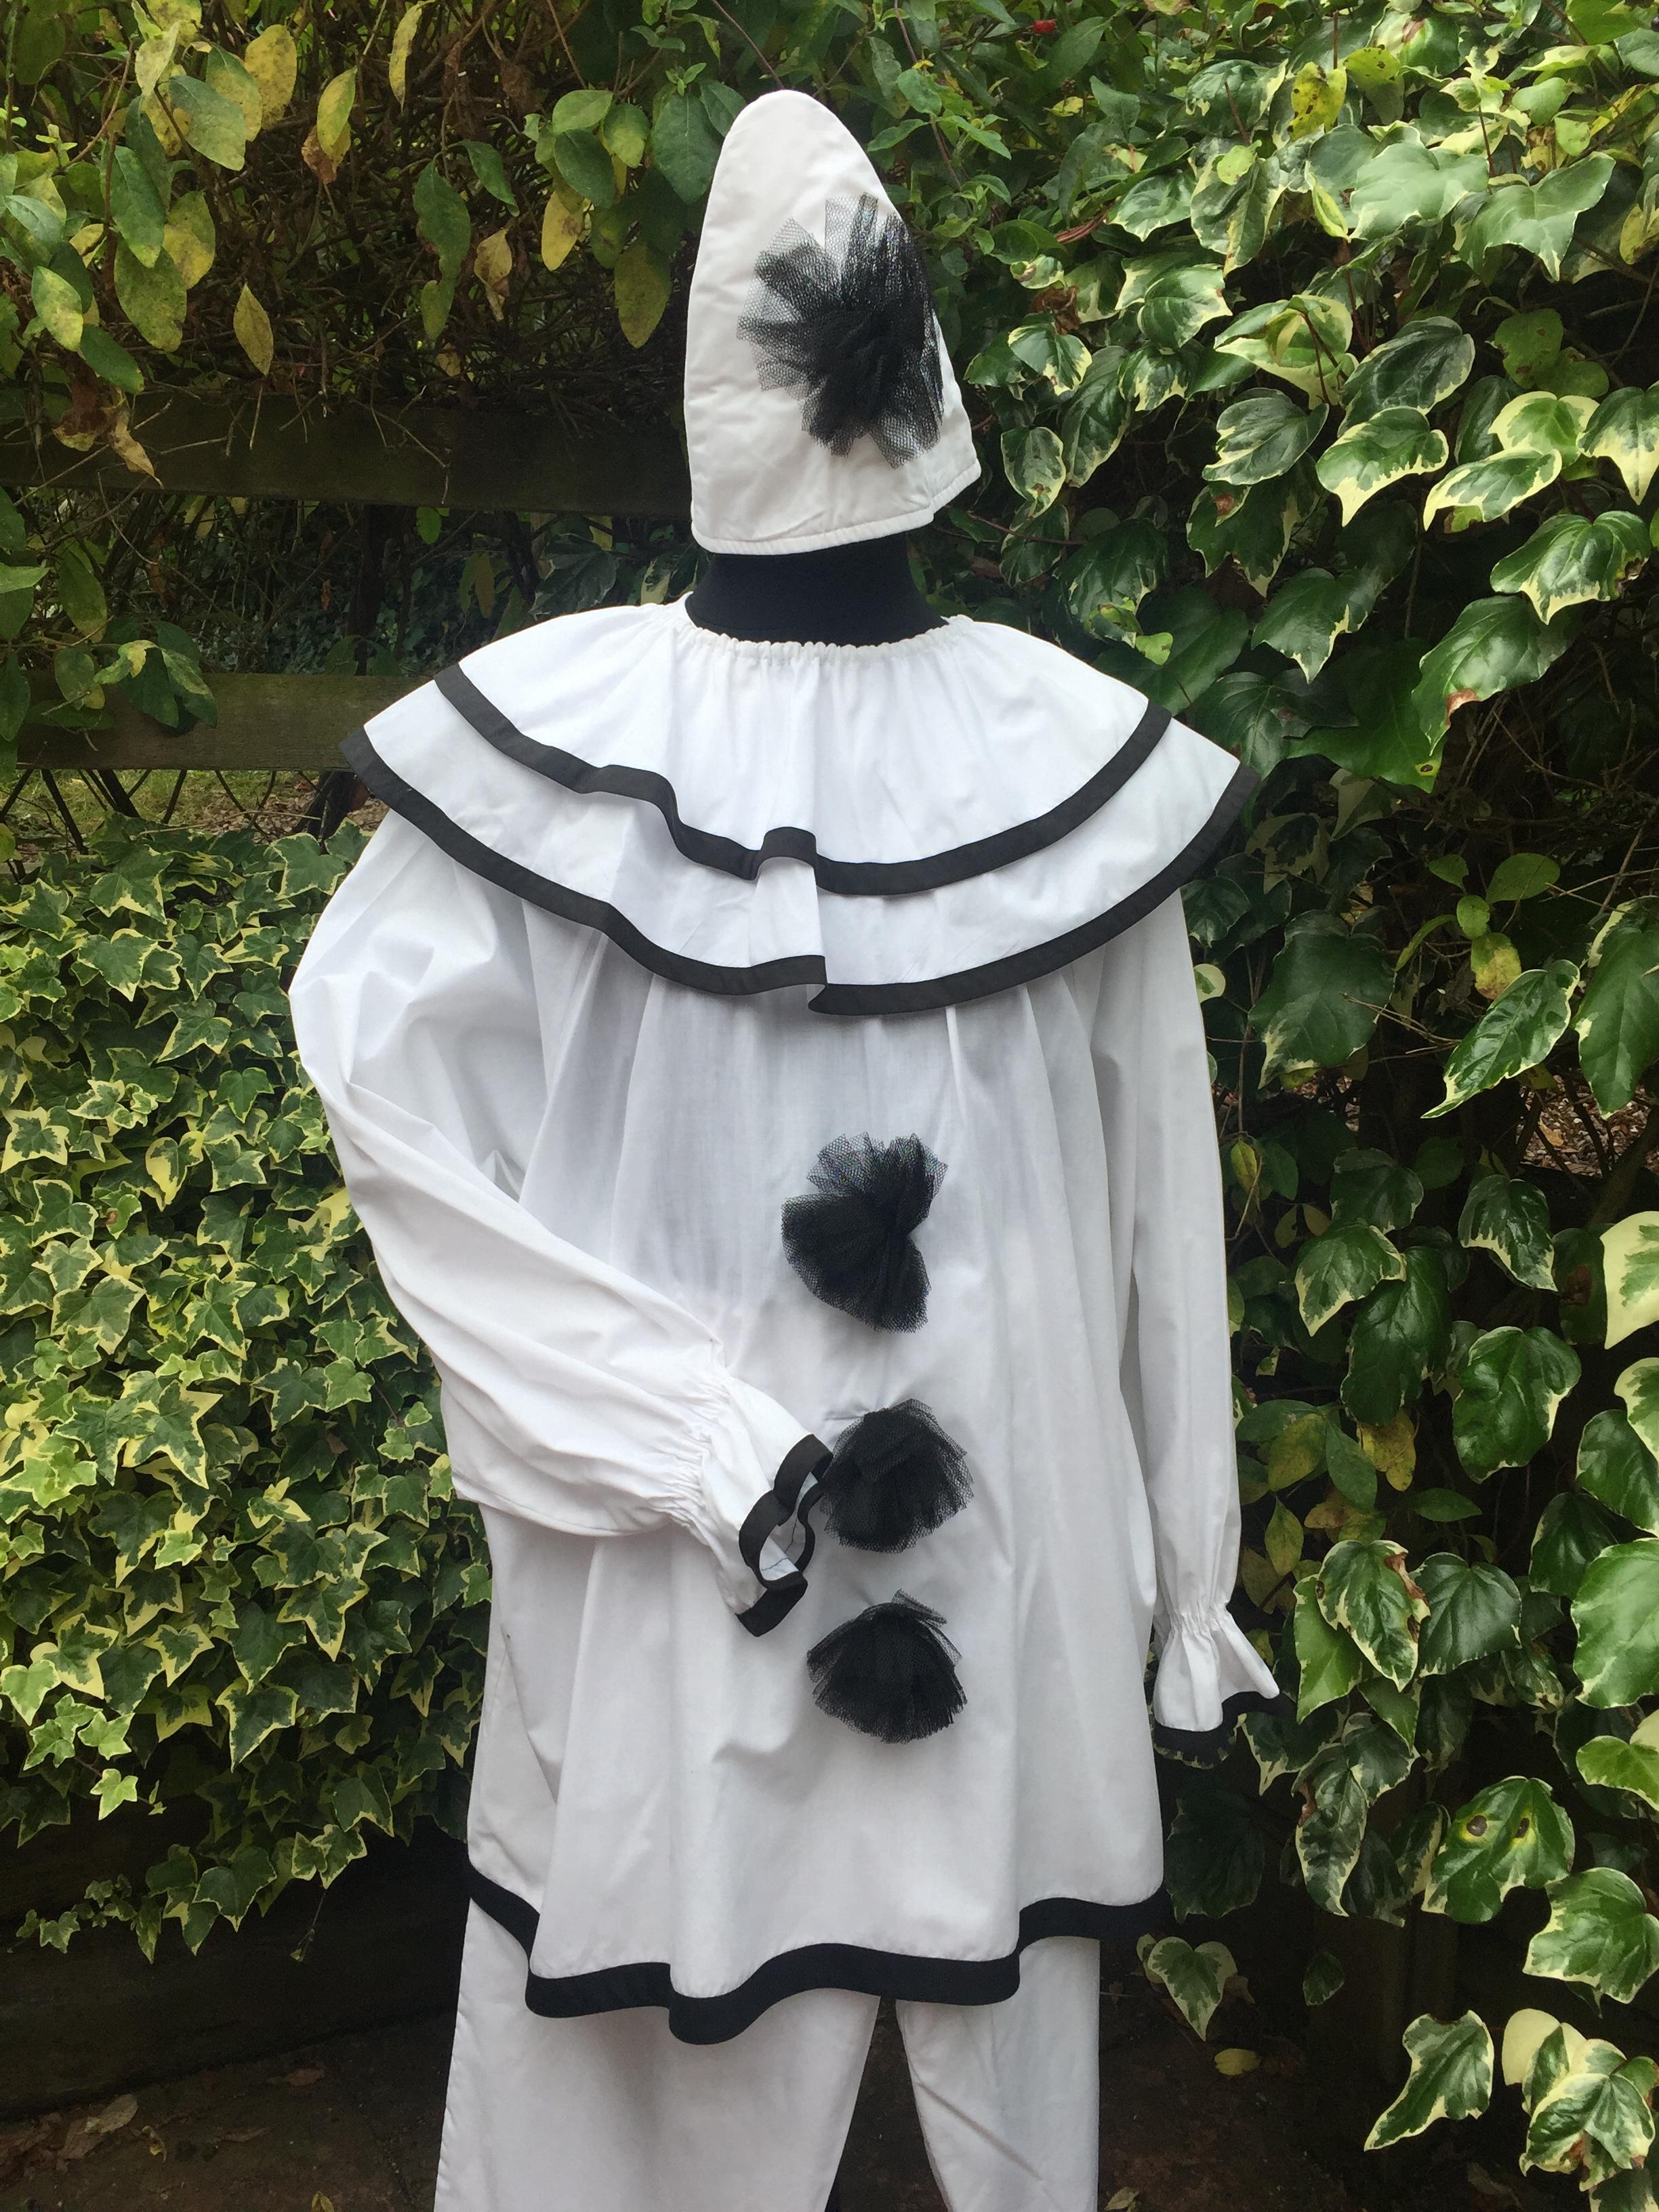 Masquerade Gents Pierrot Clown Costume Masquerade